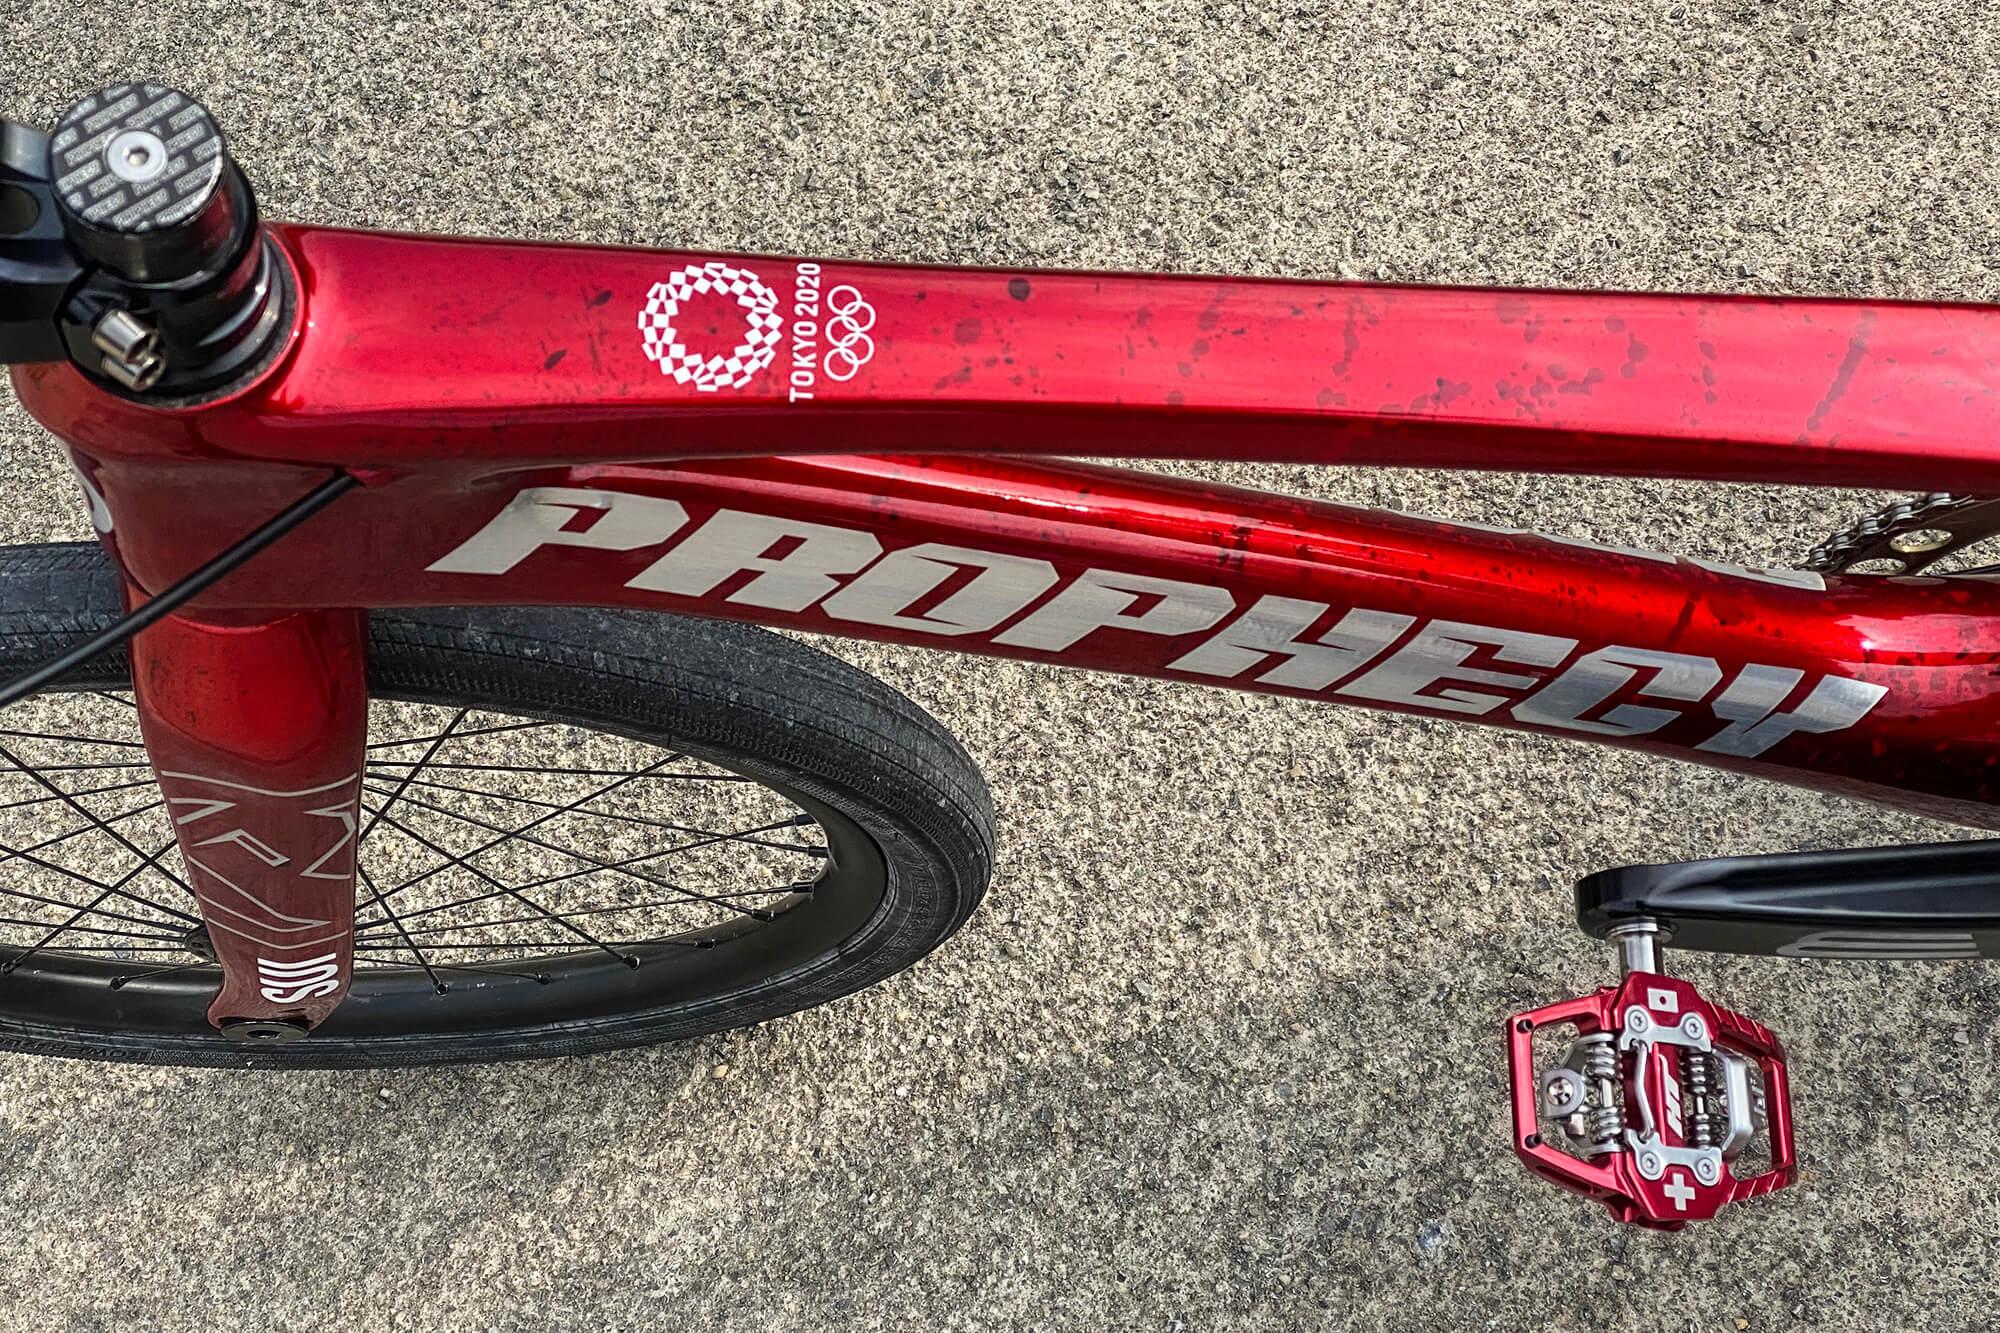 David Graf Tokyo 2020 Olympic Bike Check